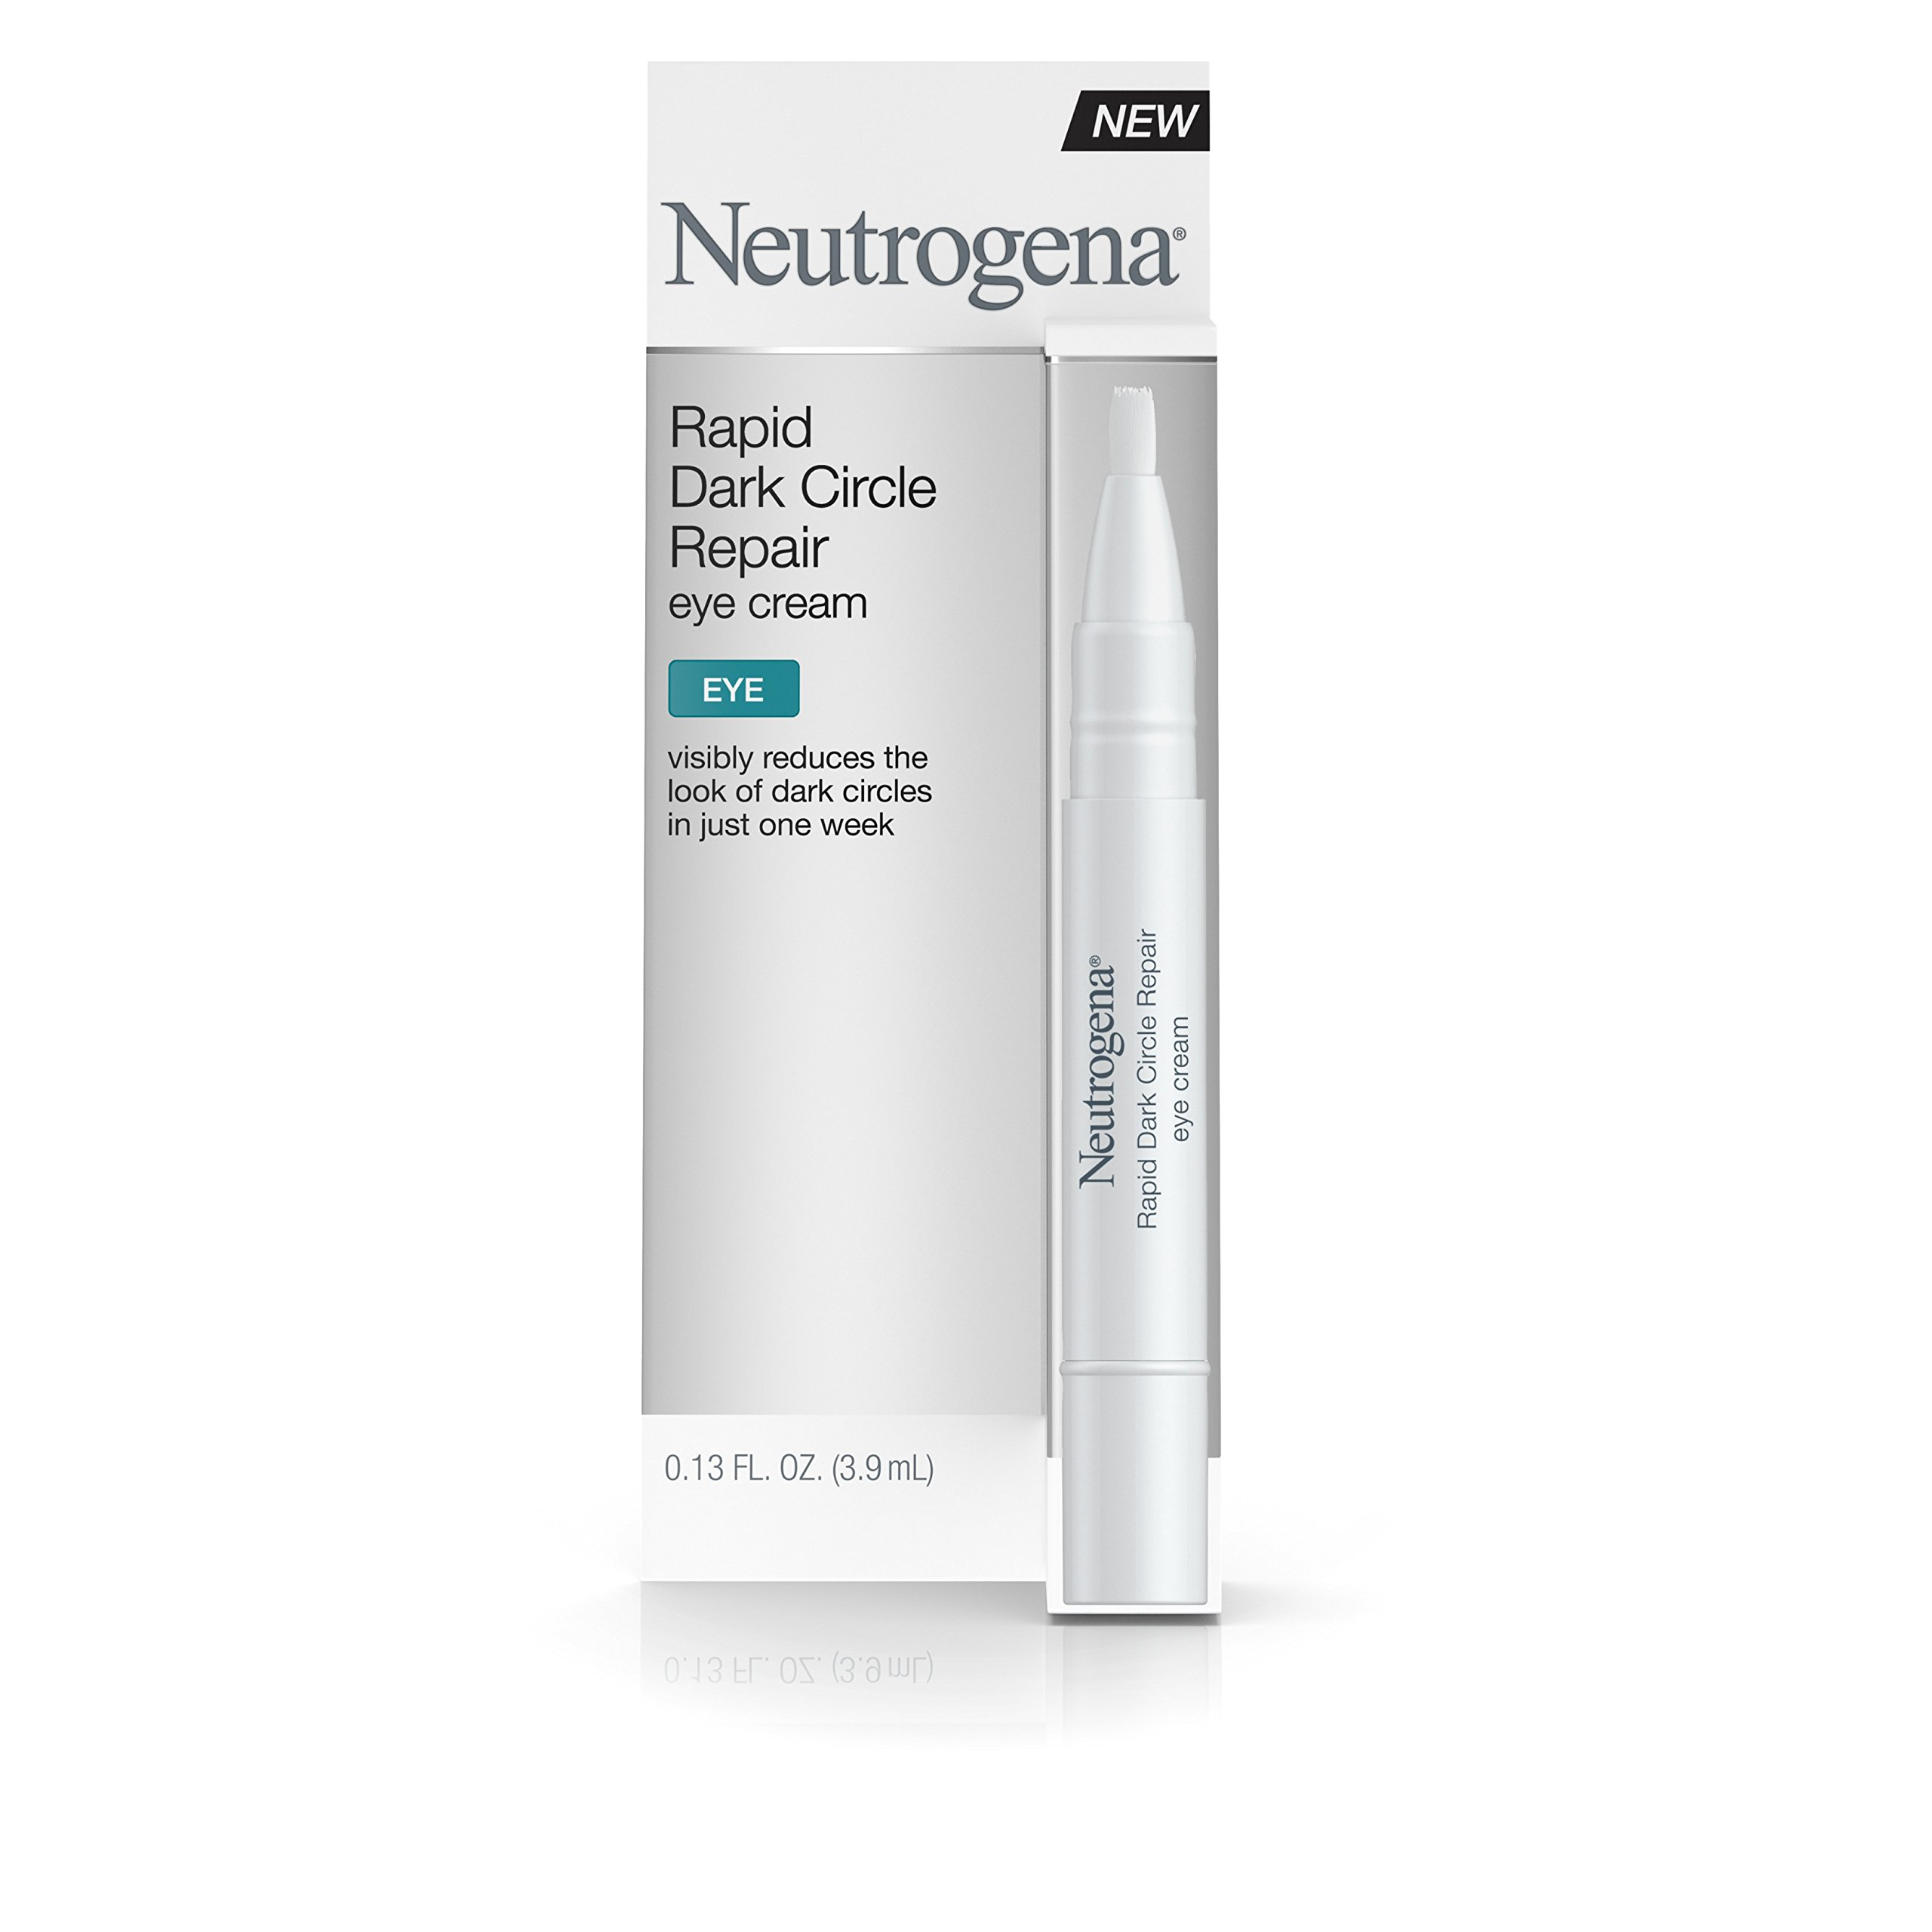 Neutrogena Rapid Dark Circle Repair Eye Cream, .13 Fl. Oz